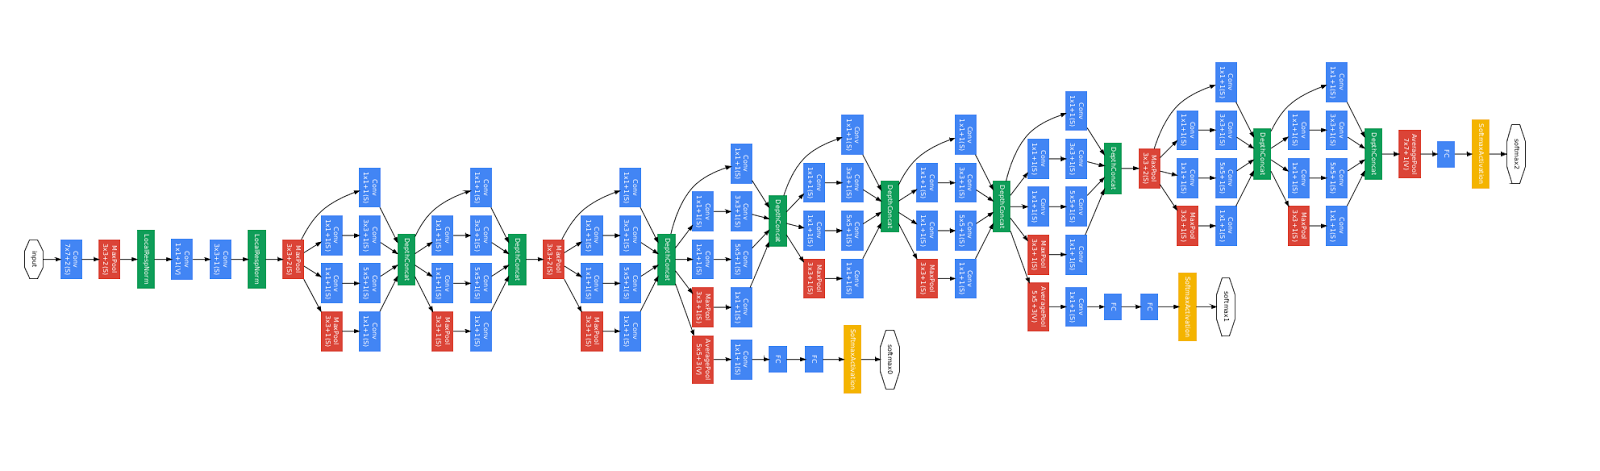 GoogleNet architecture chart